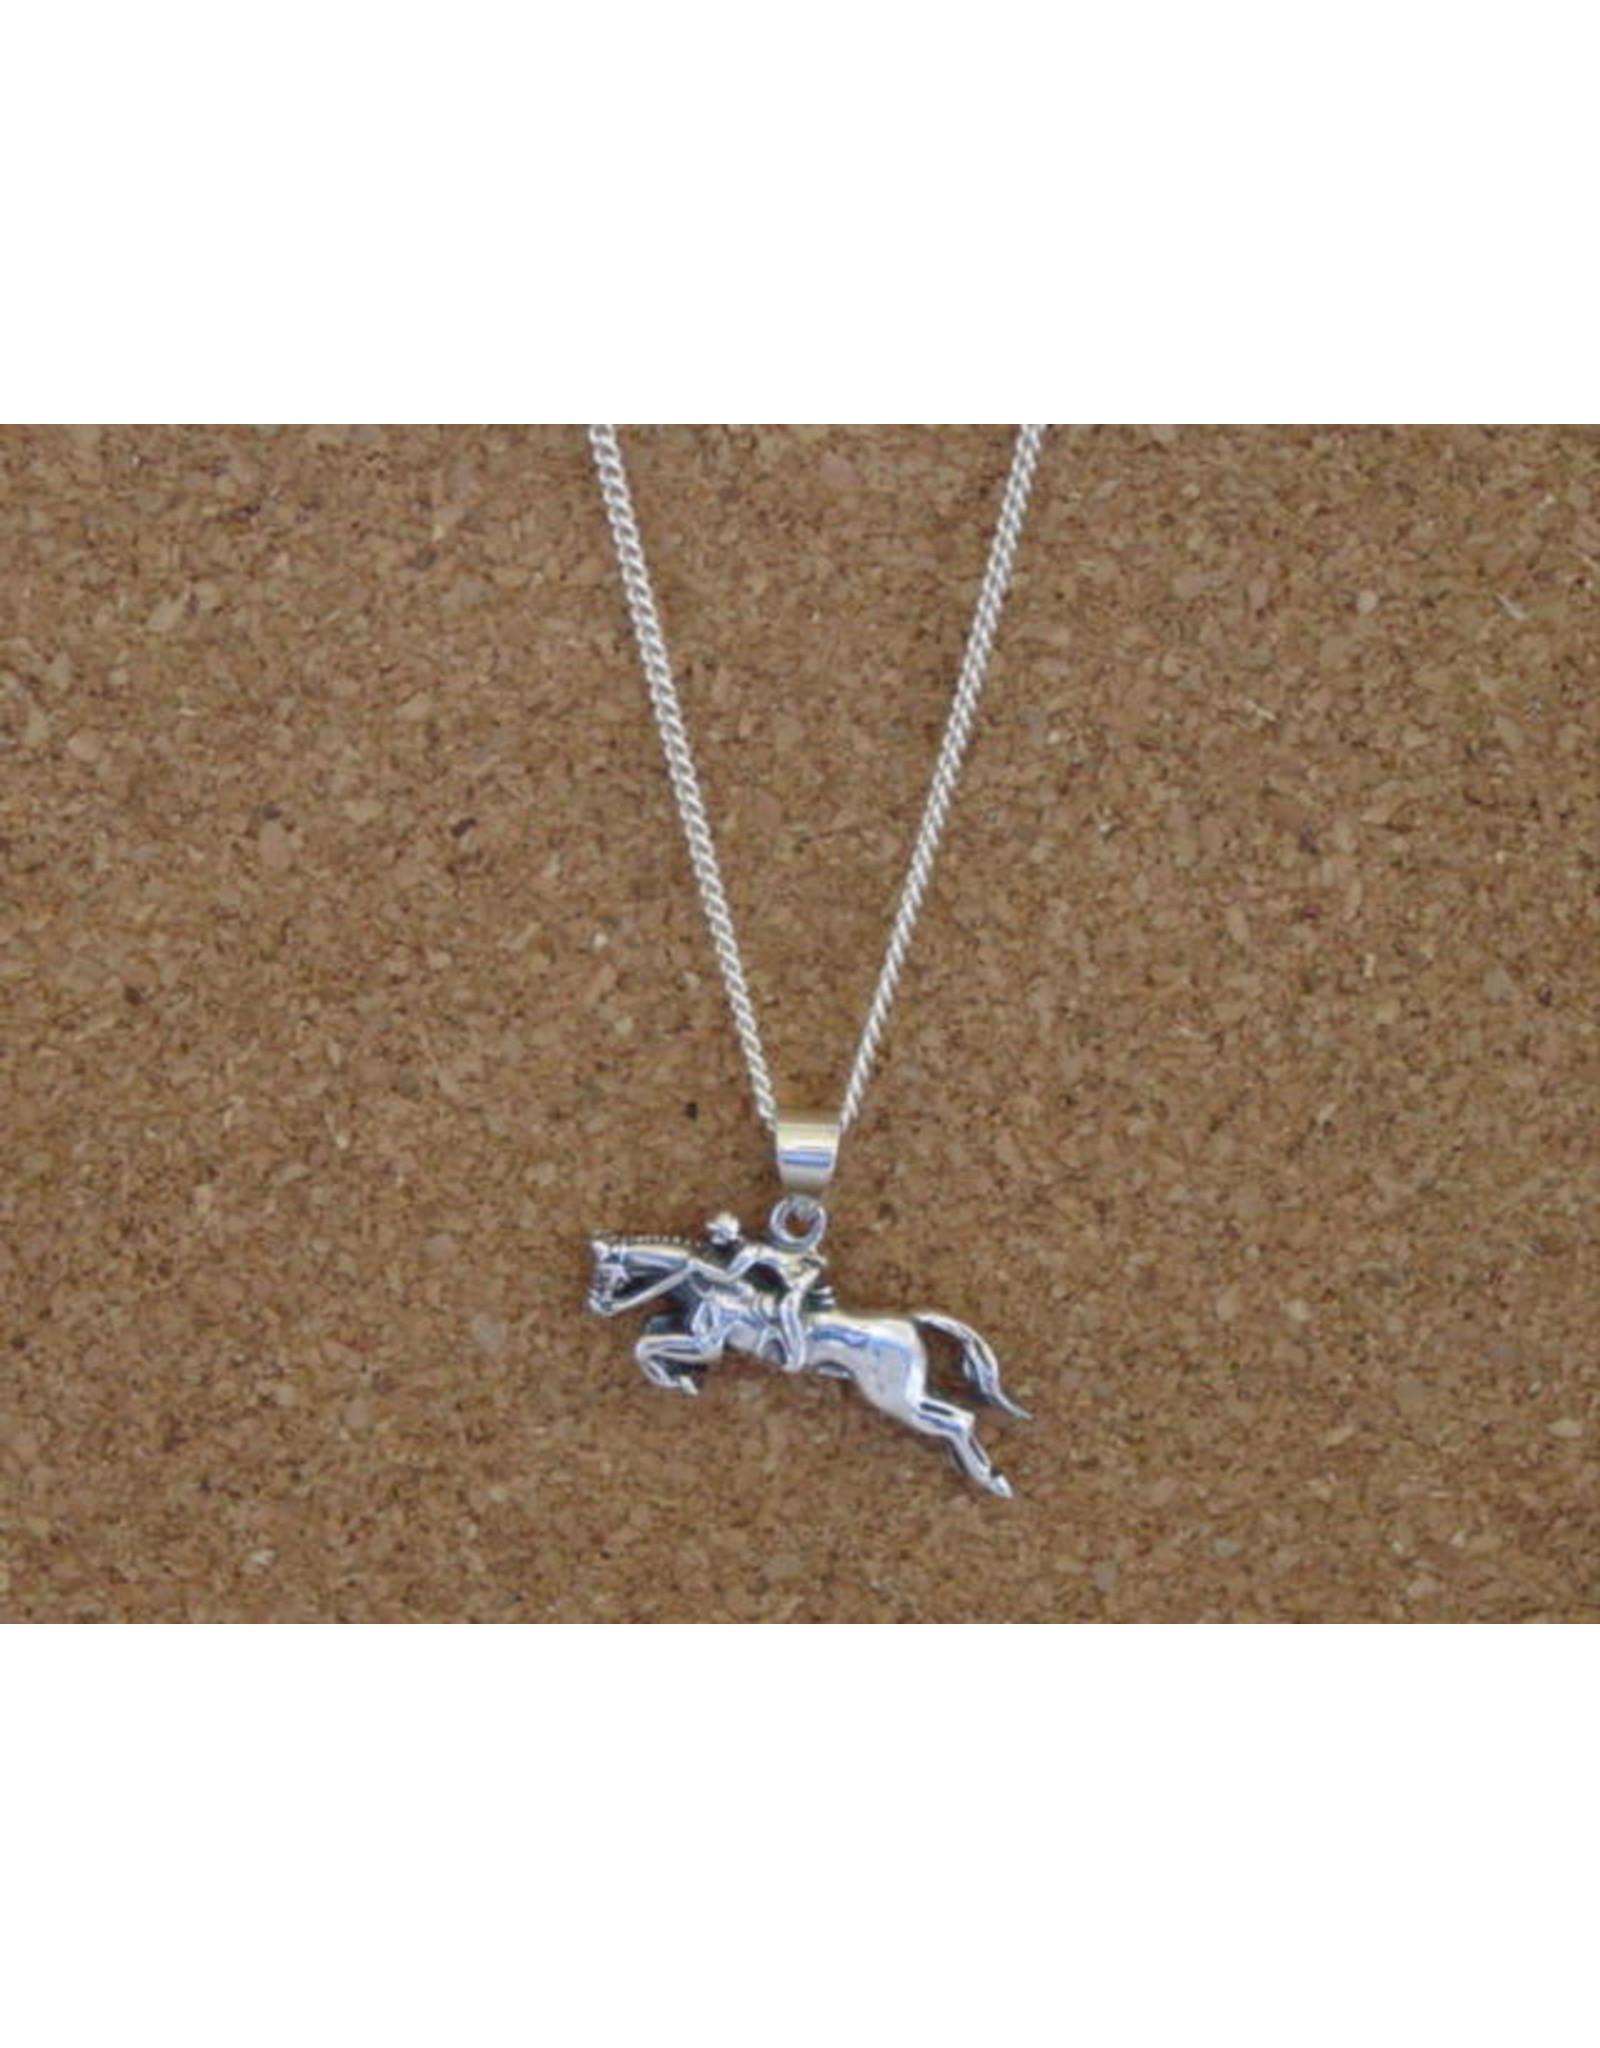 "Baron Equestrian Necklace Hunter Jumper Pendant with 18"" Chain P508"